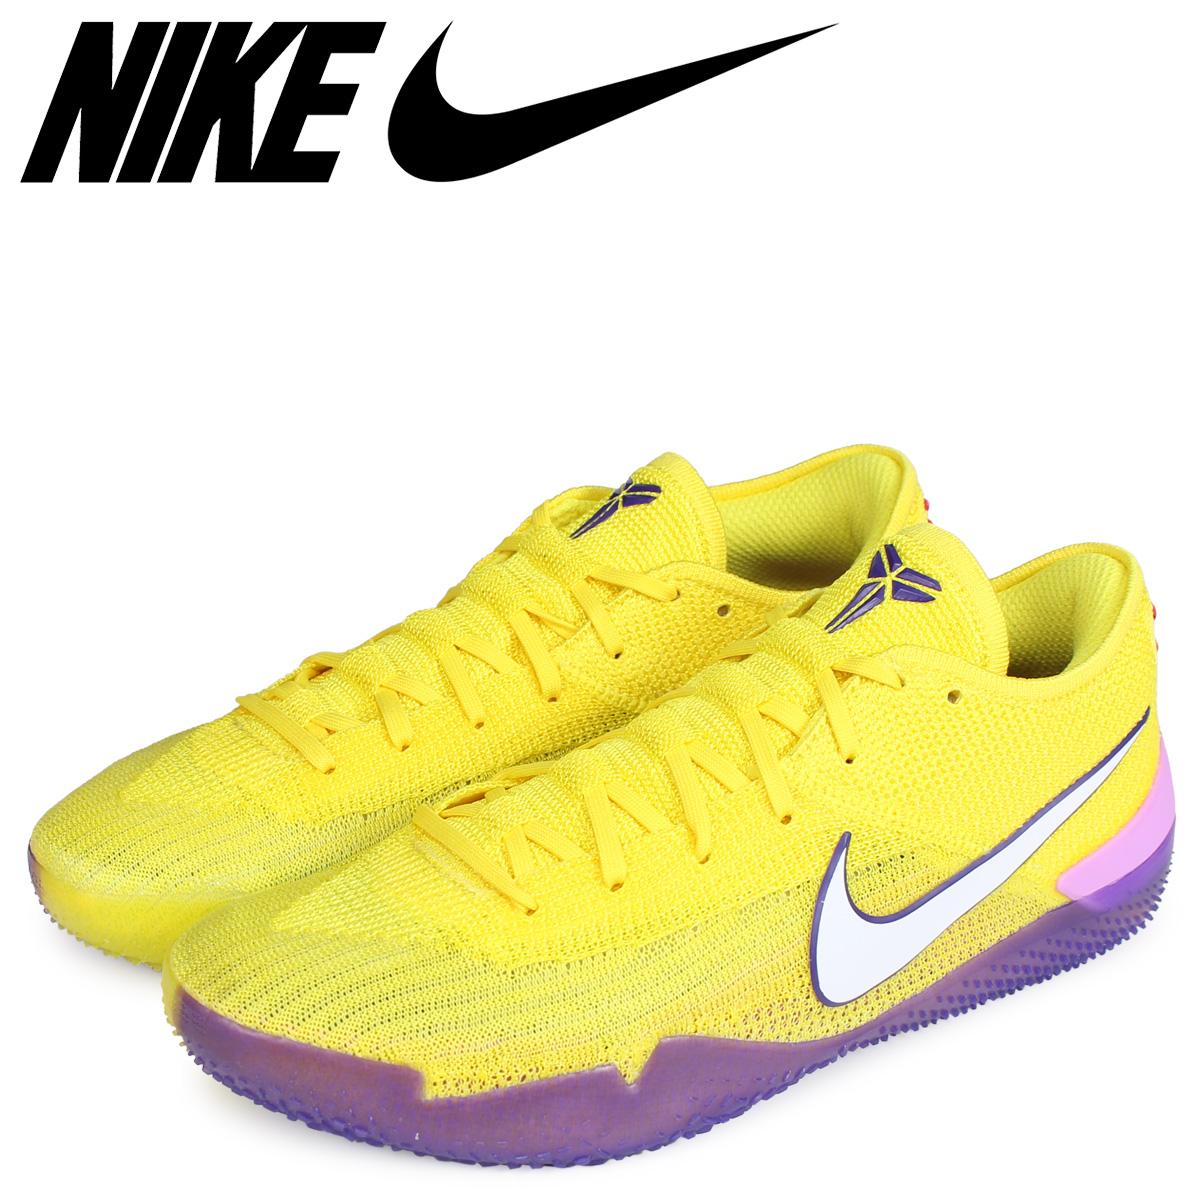 NIKE ナイキ コービー スニーカー メンズ KOBE NXT 360 Lakers イエロー AQ1087-700